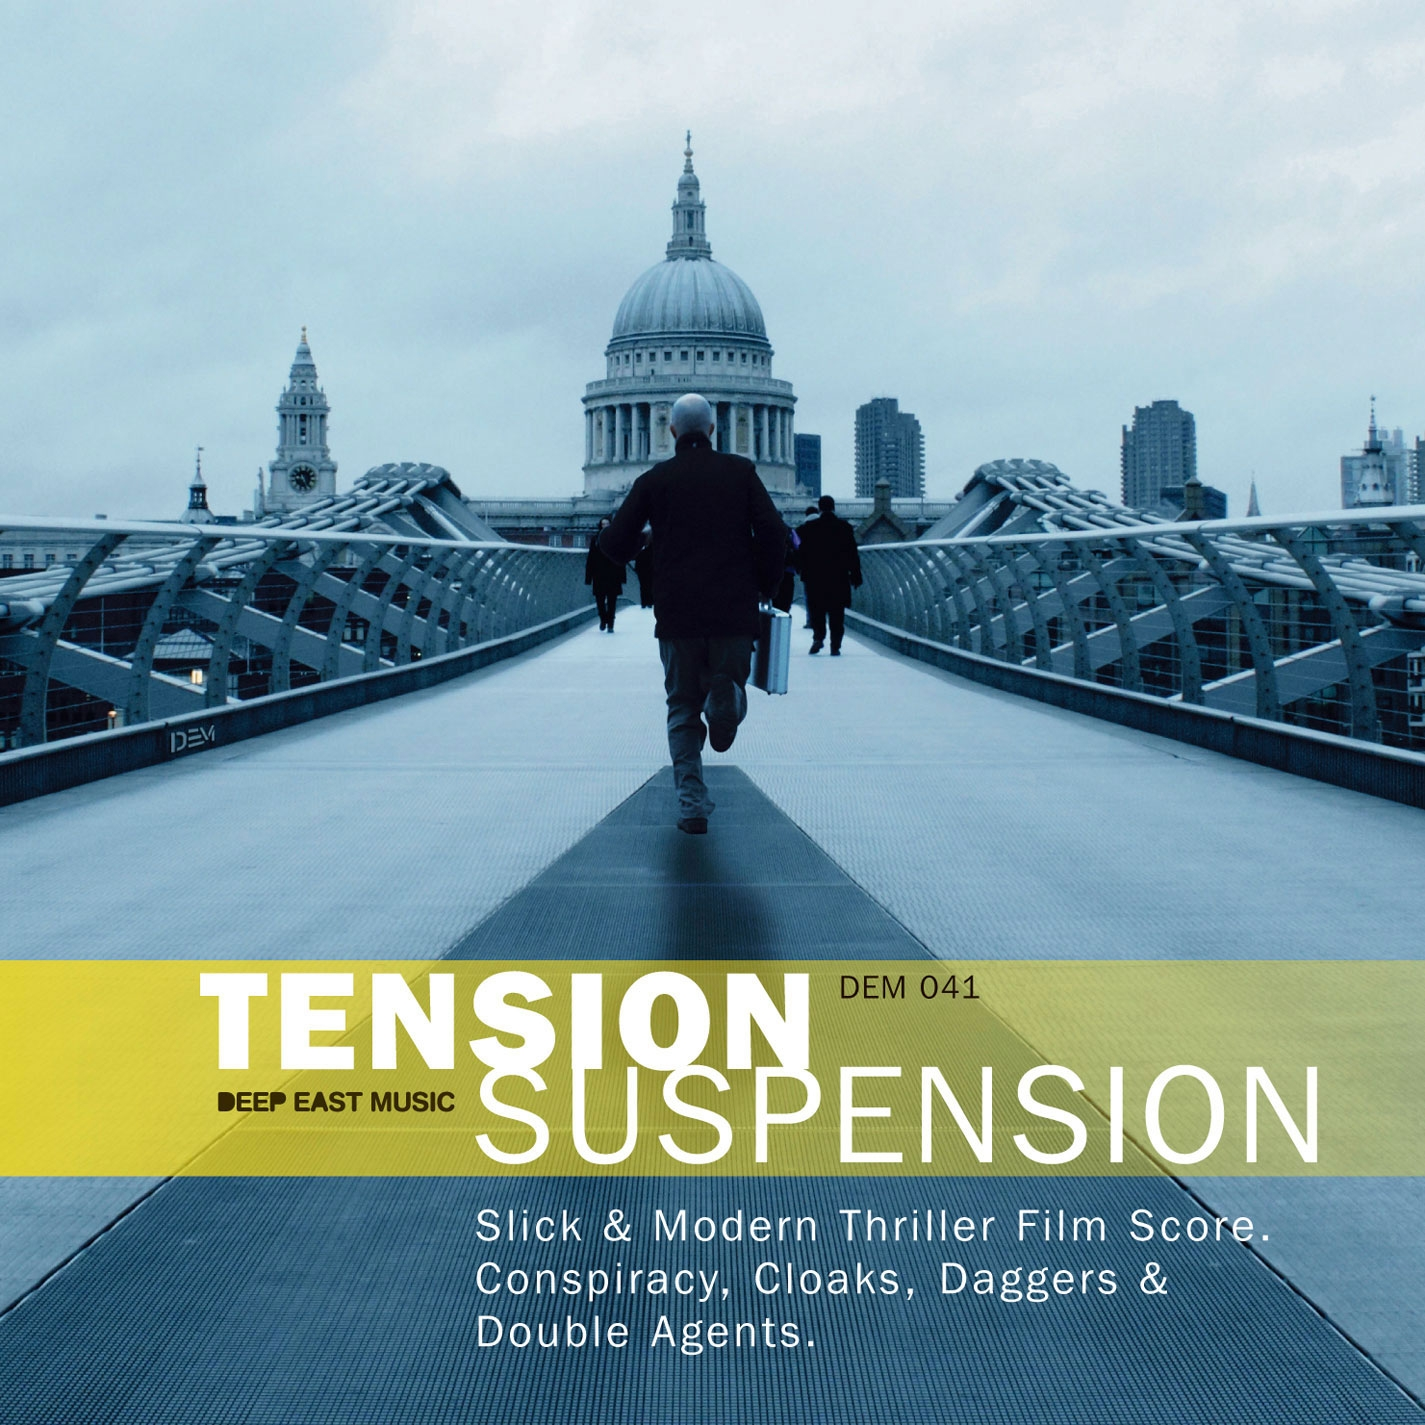 Tension Suspension